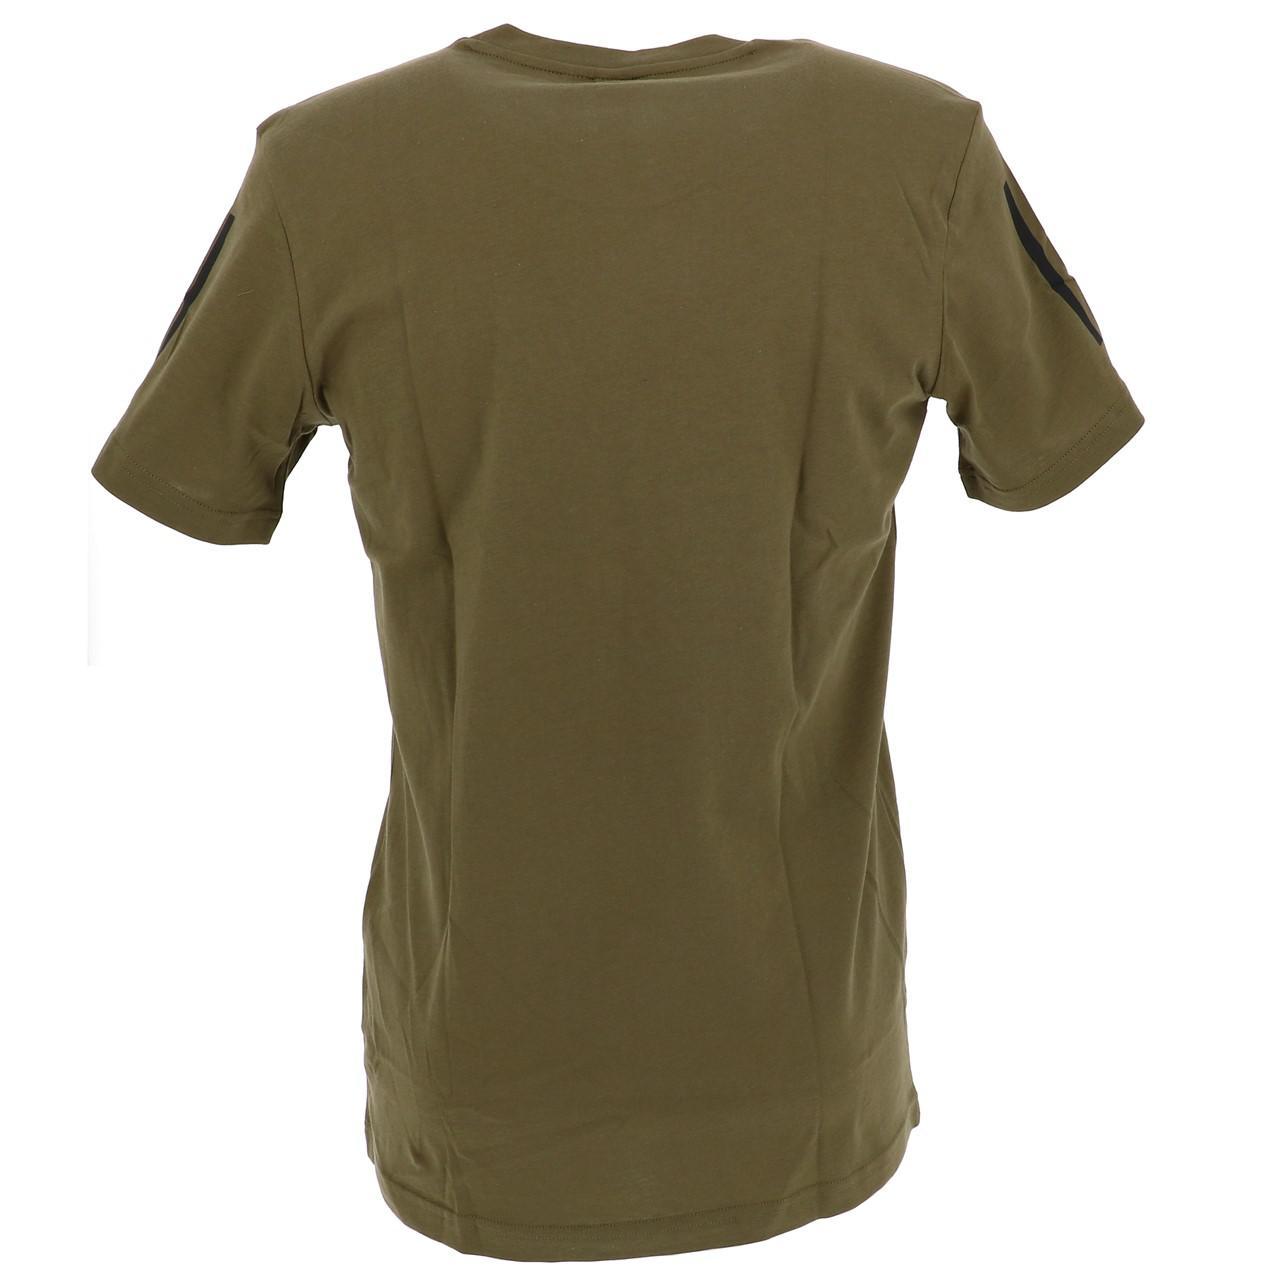 Short-Adidas-Sid-Khaki-Mc-Tee-Green-18234-New thumbnail 5